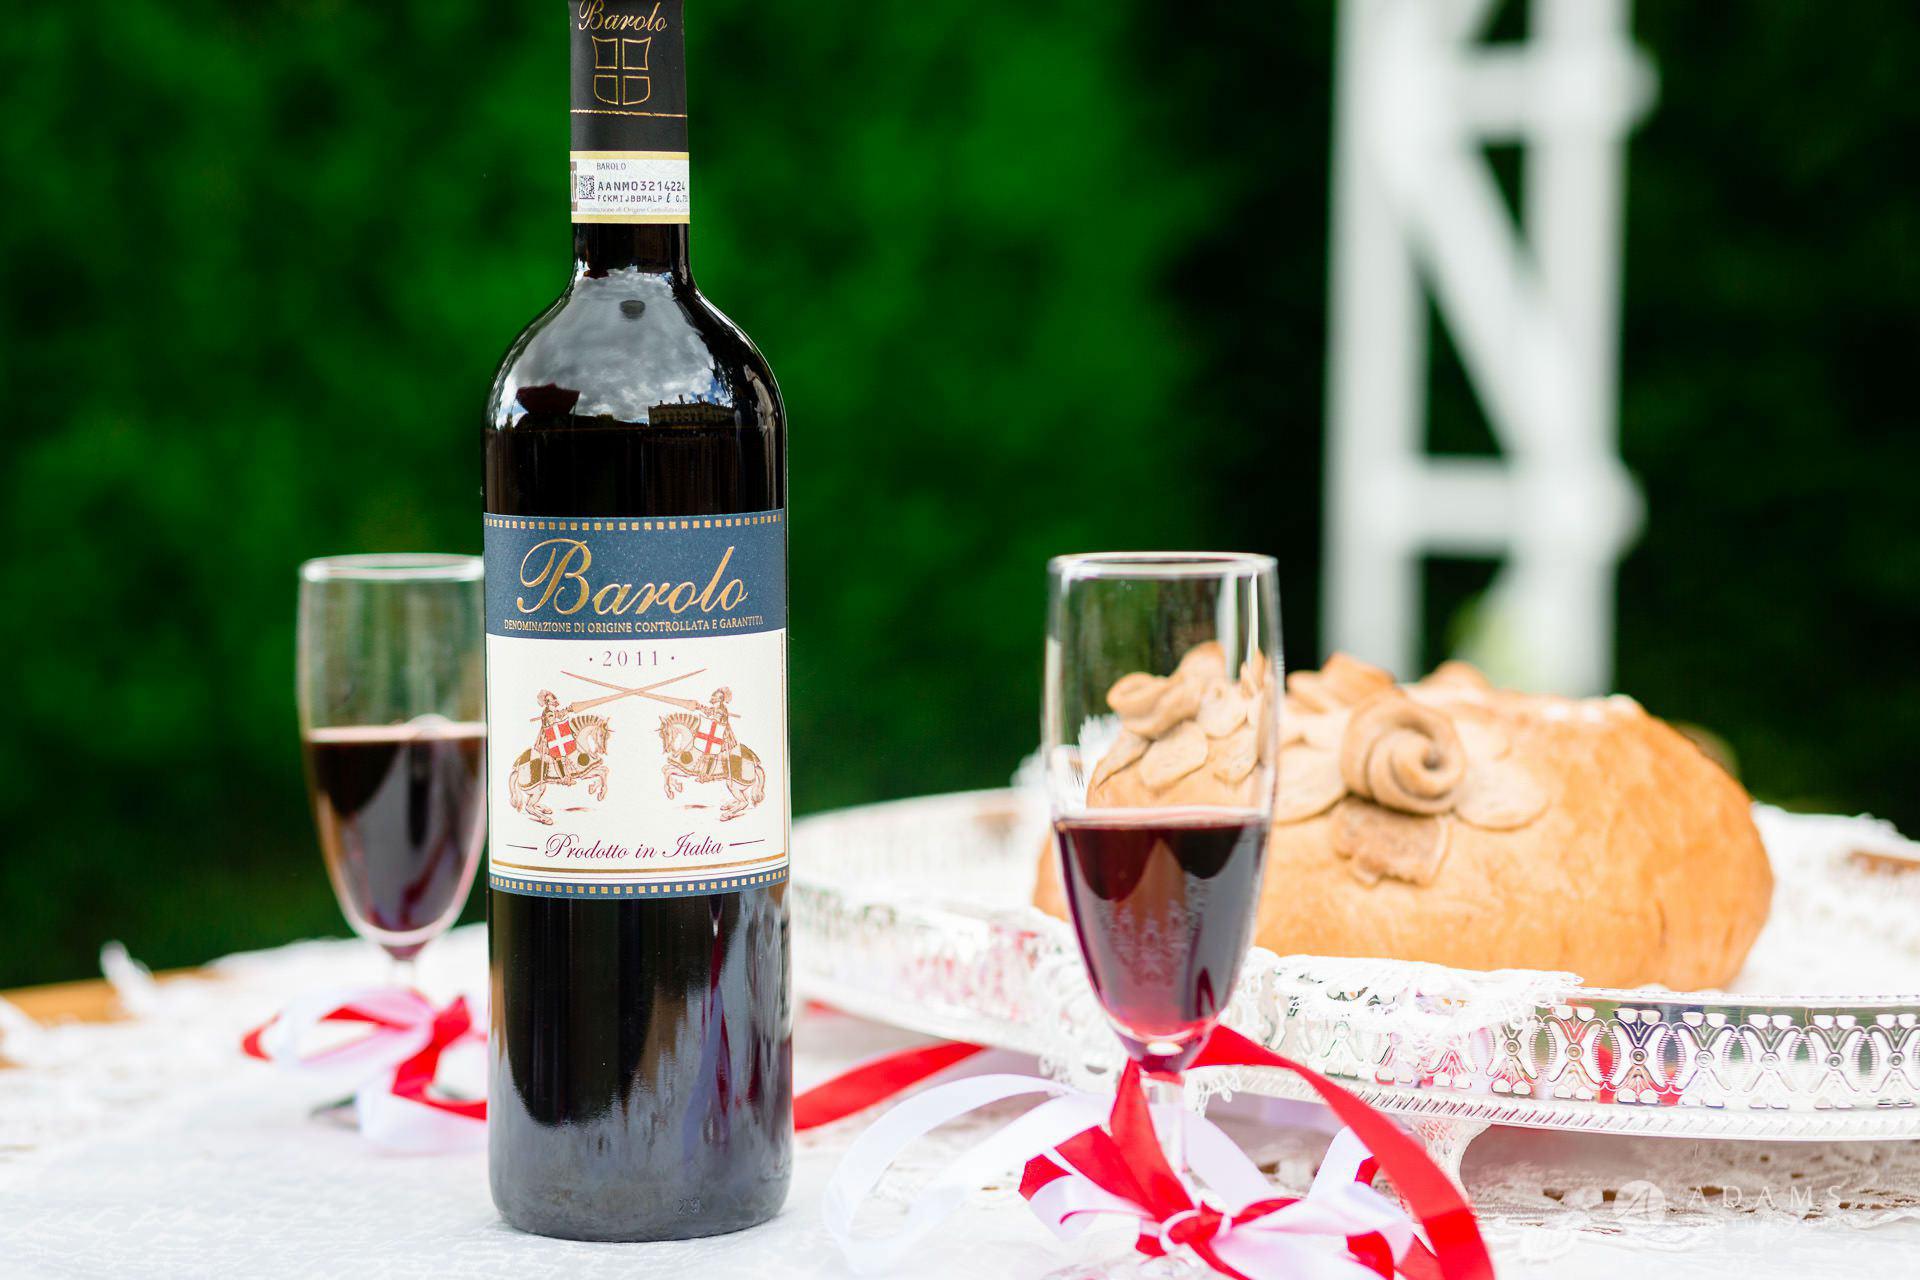 Clare College wedding ceremony wine and bread